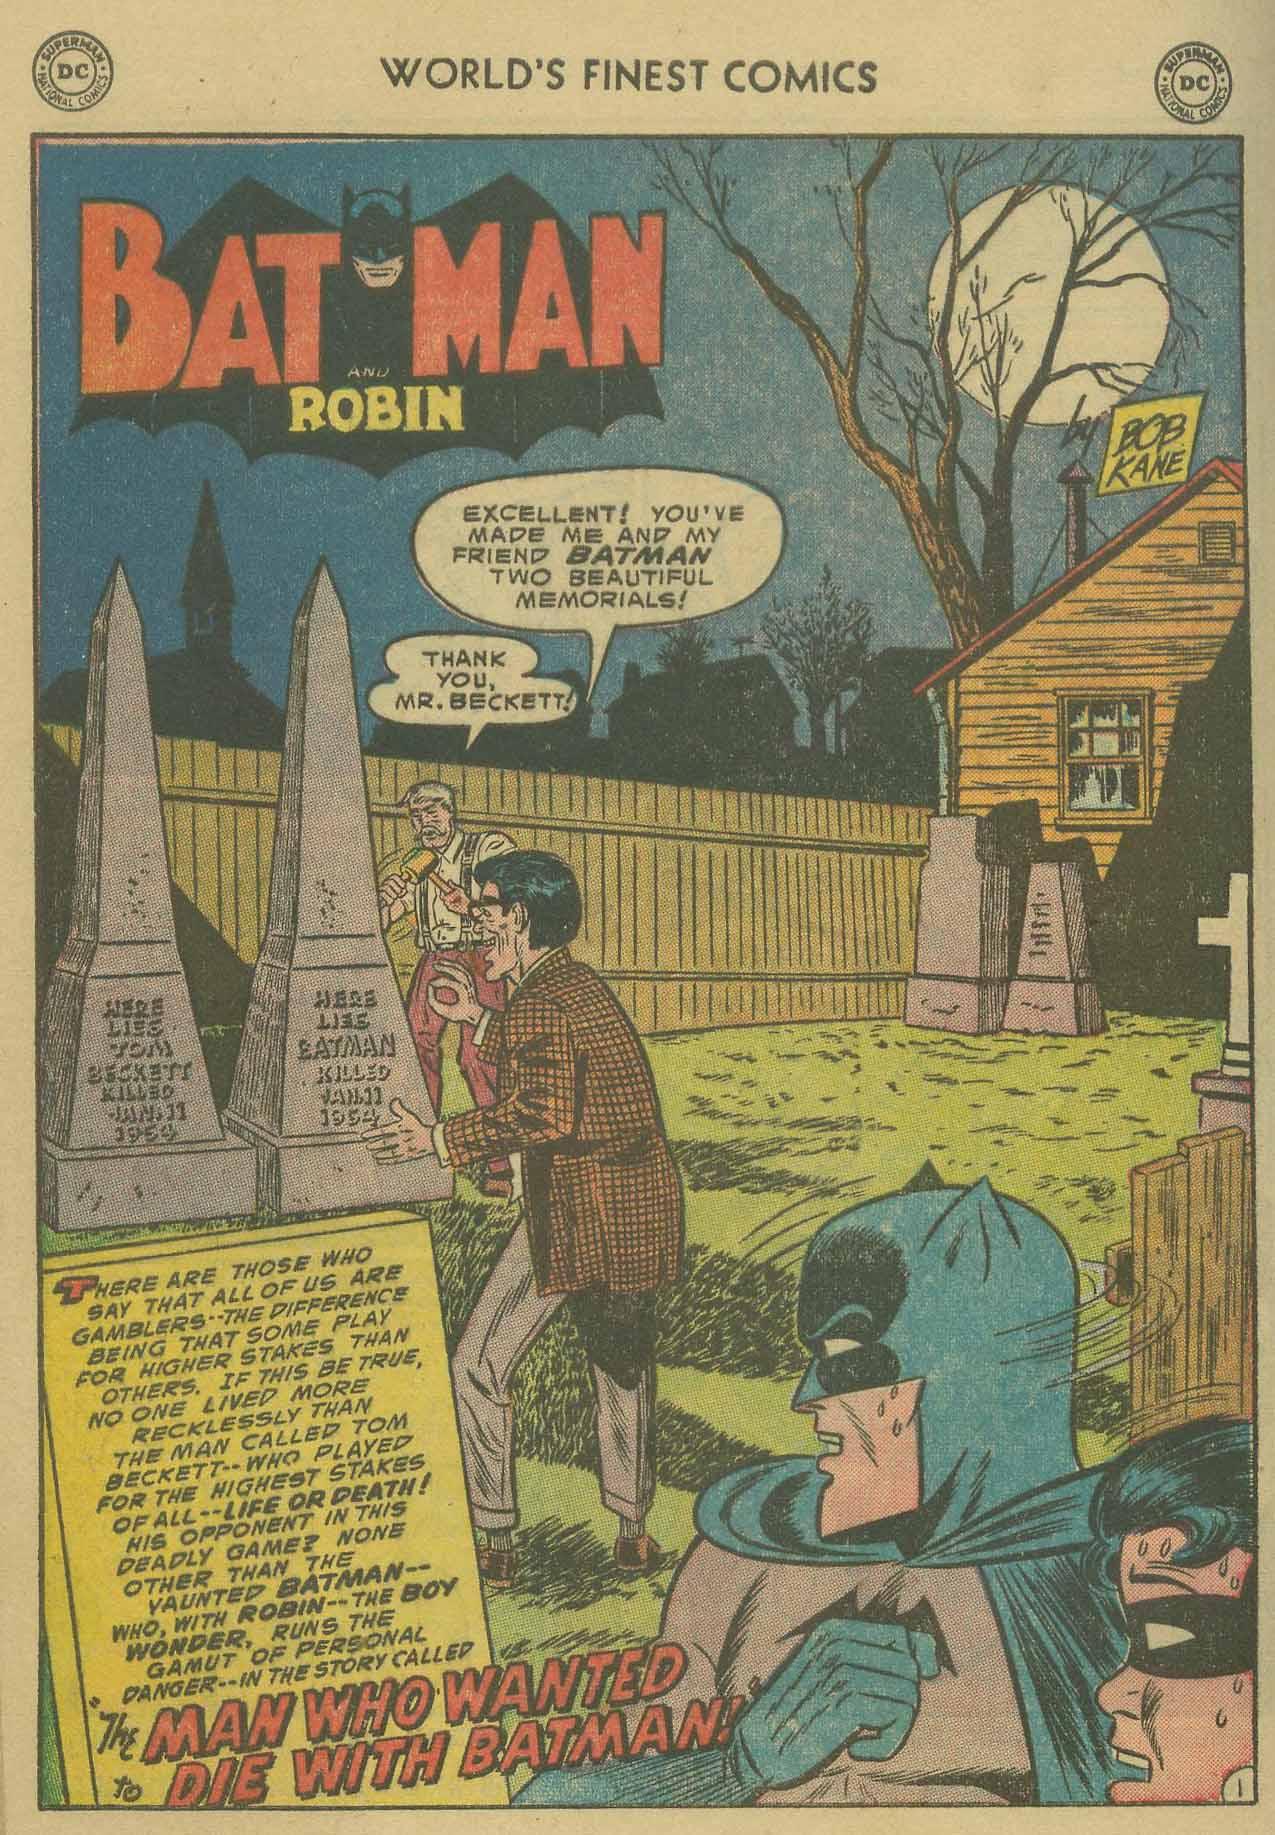 Read online World's Finest Comics comic -  Issue #69 - 54